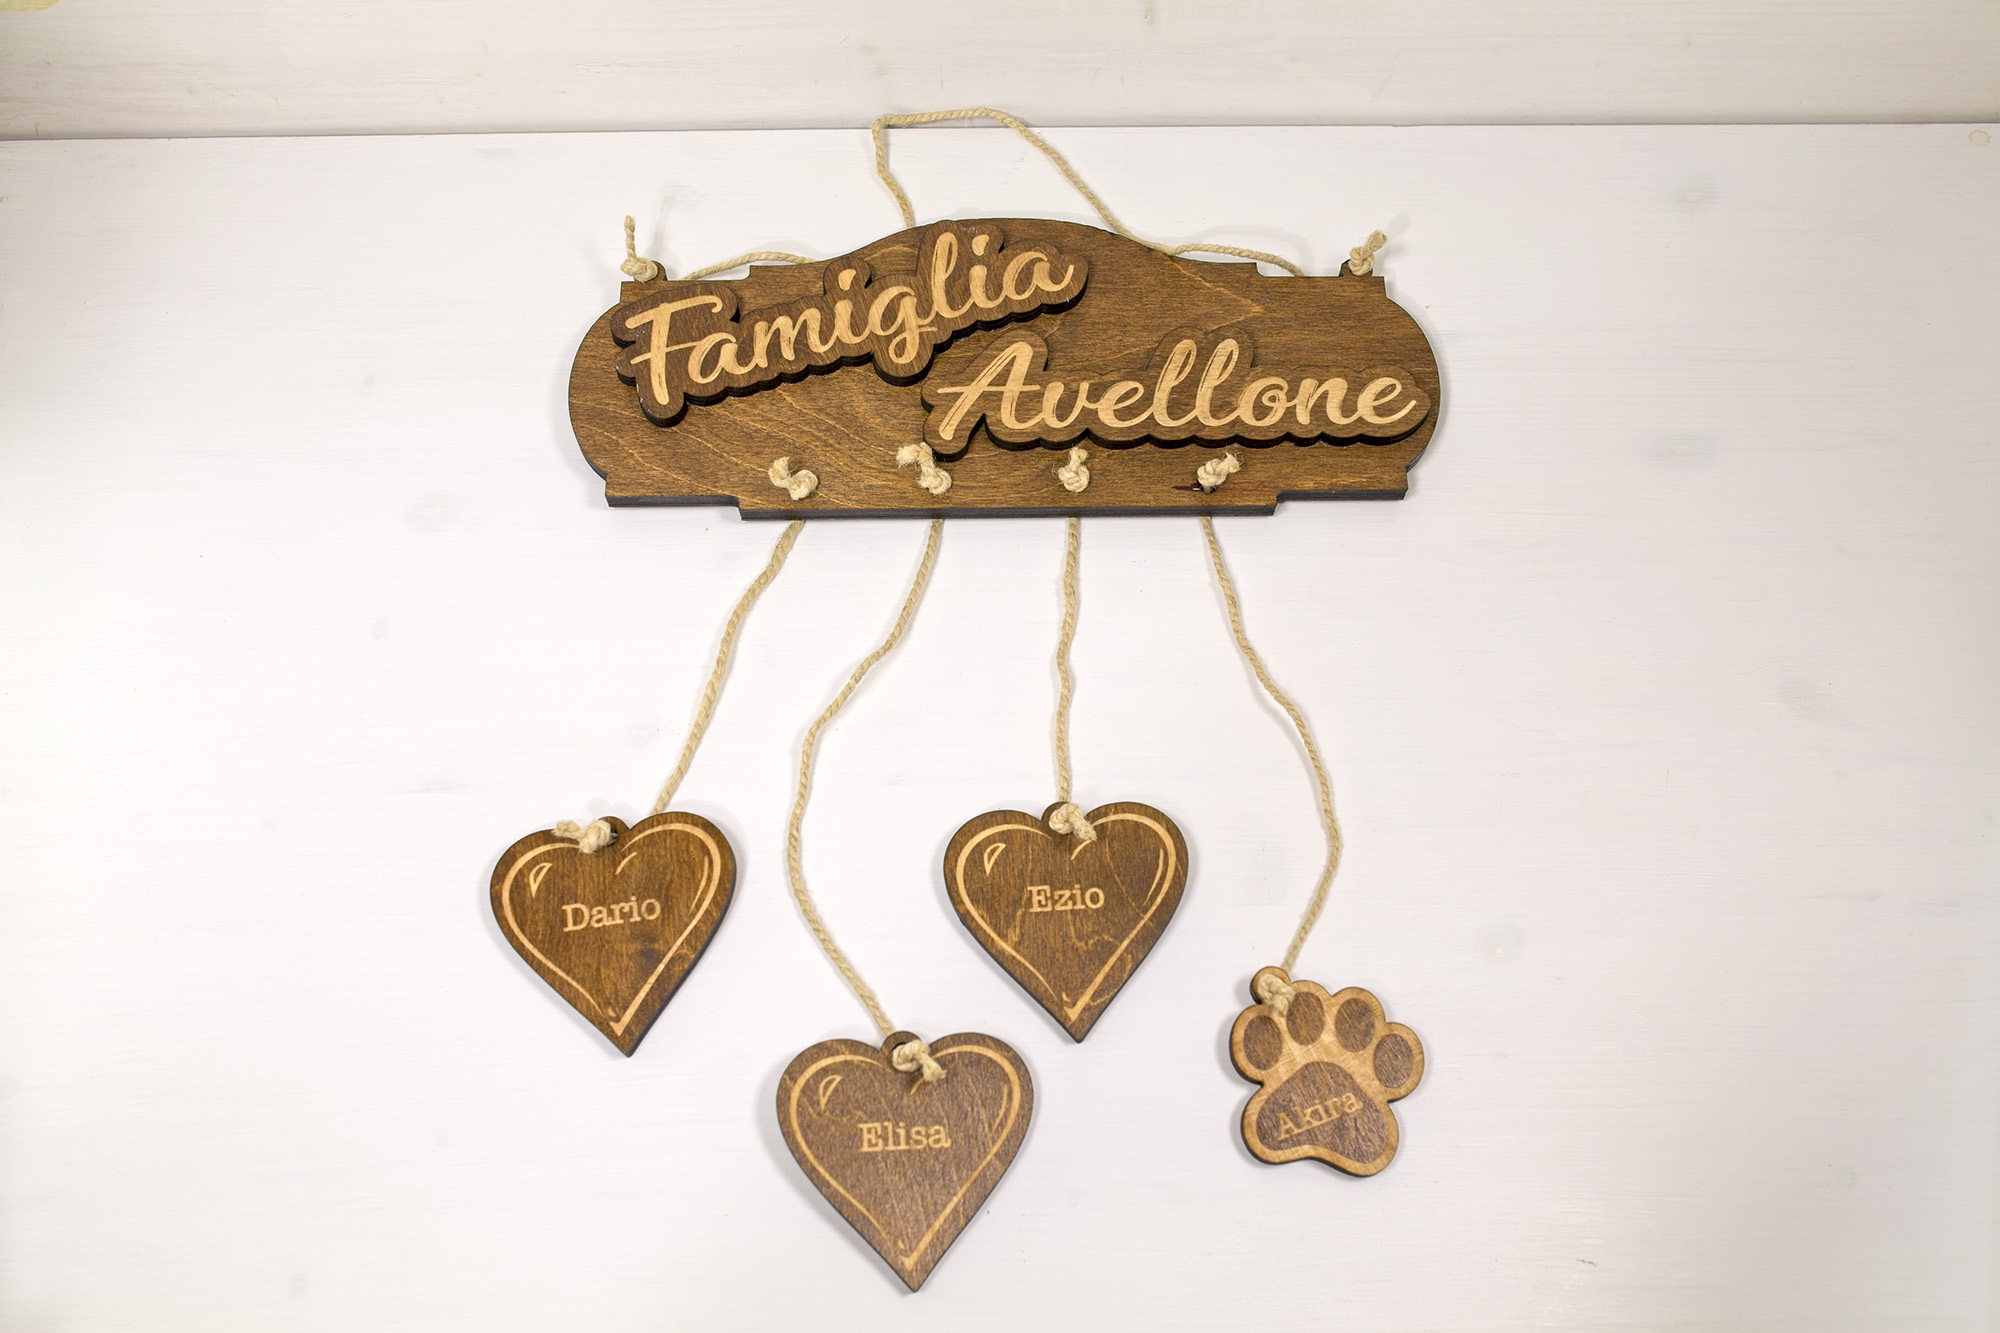 Targa Famiglia Avellone